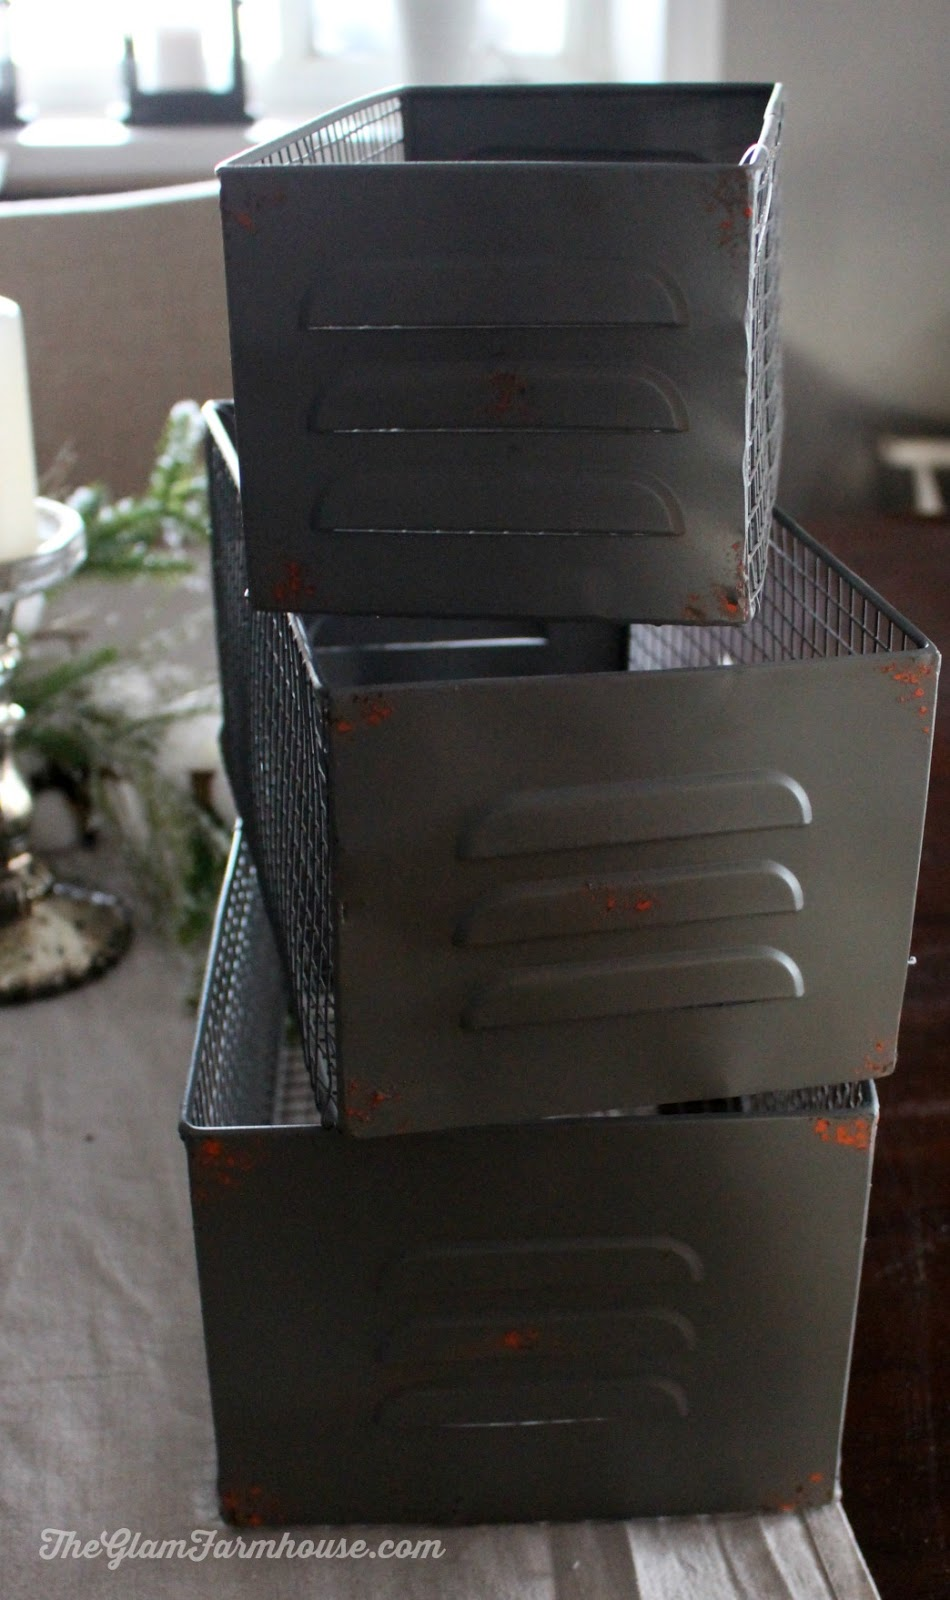 Surprise decor steals box reveal the glam farmhouse for Decor steals